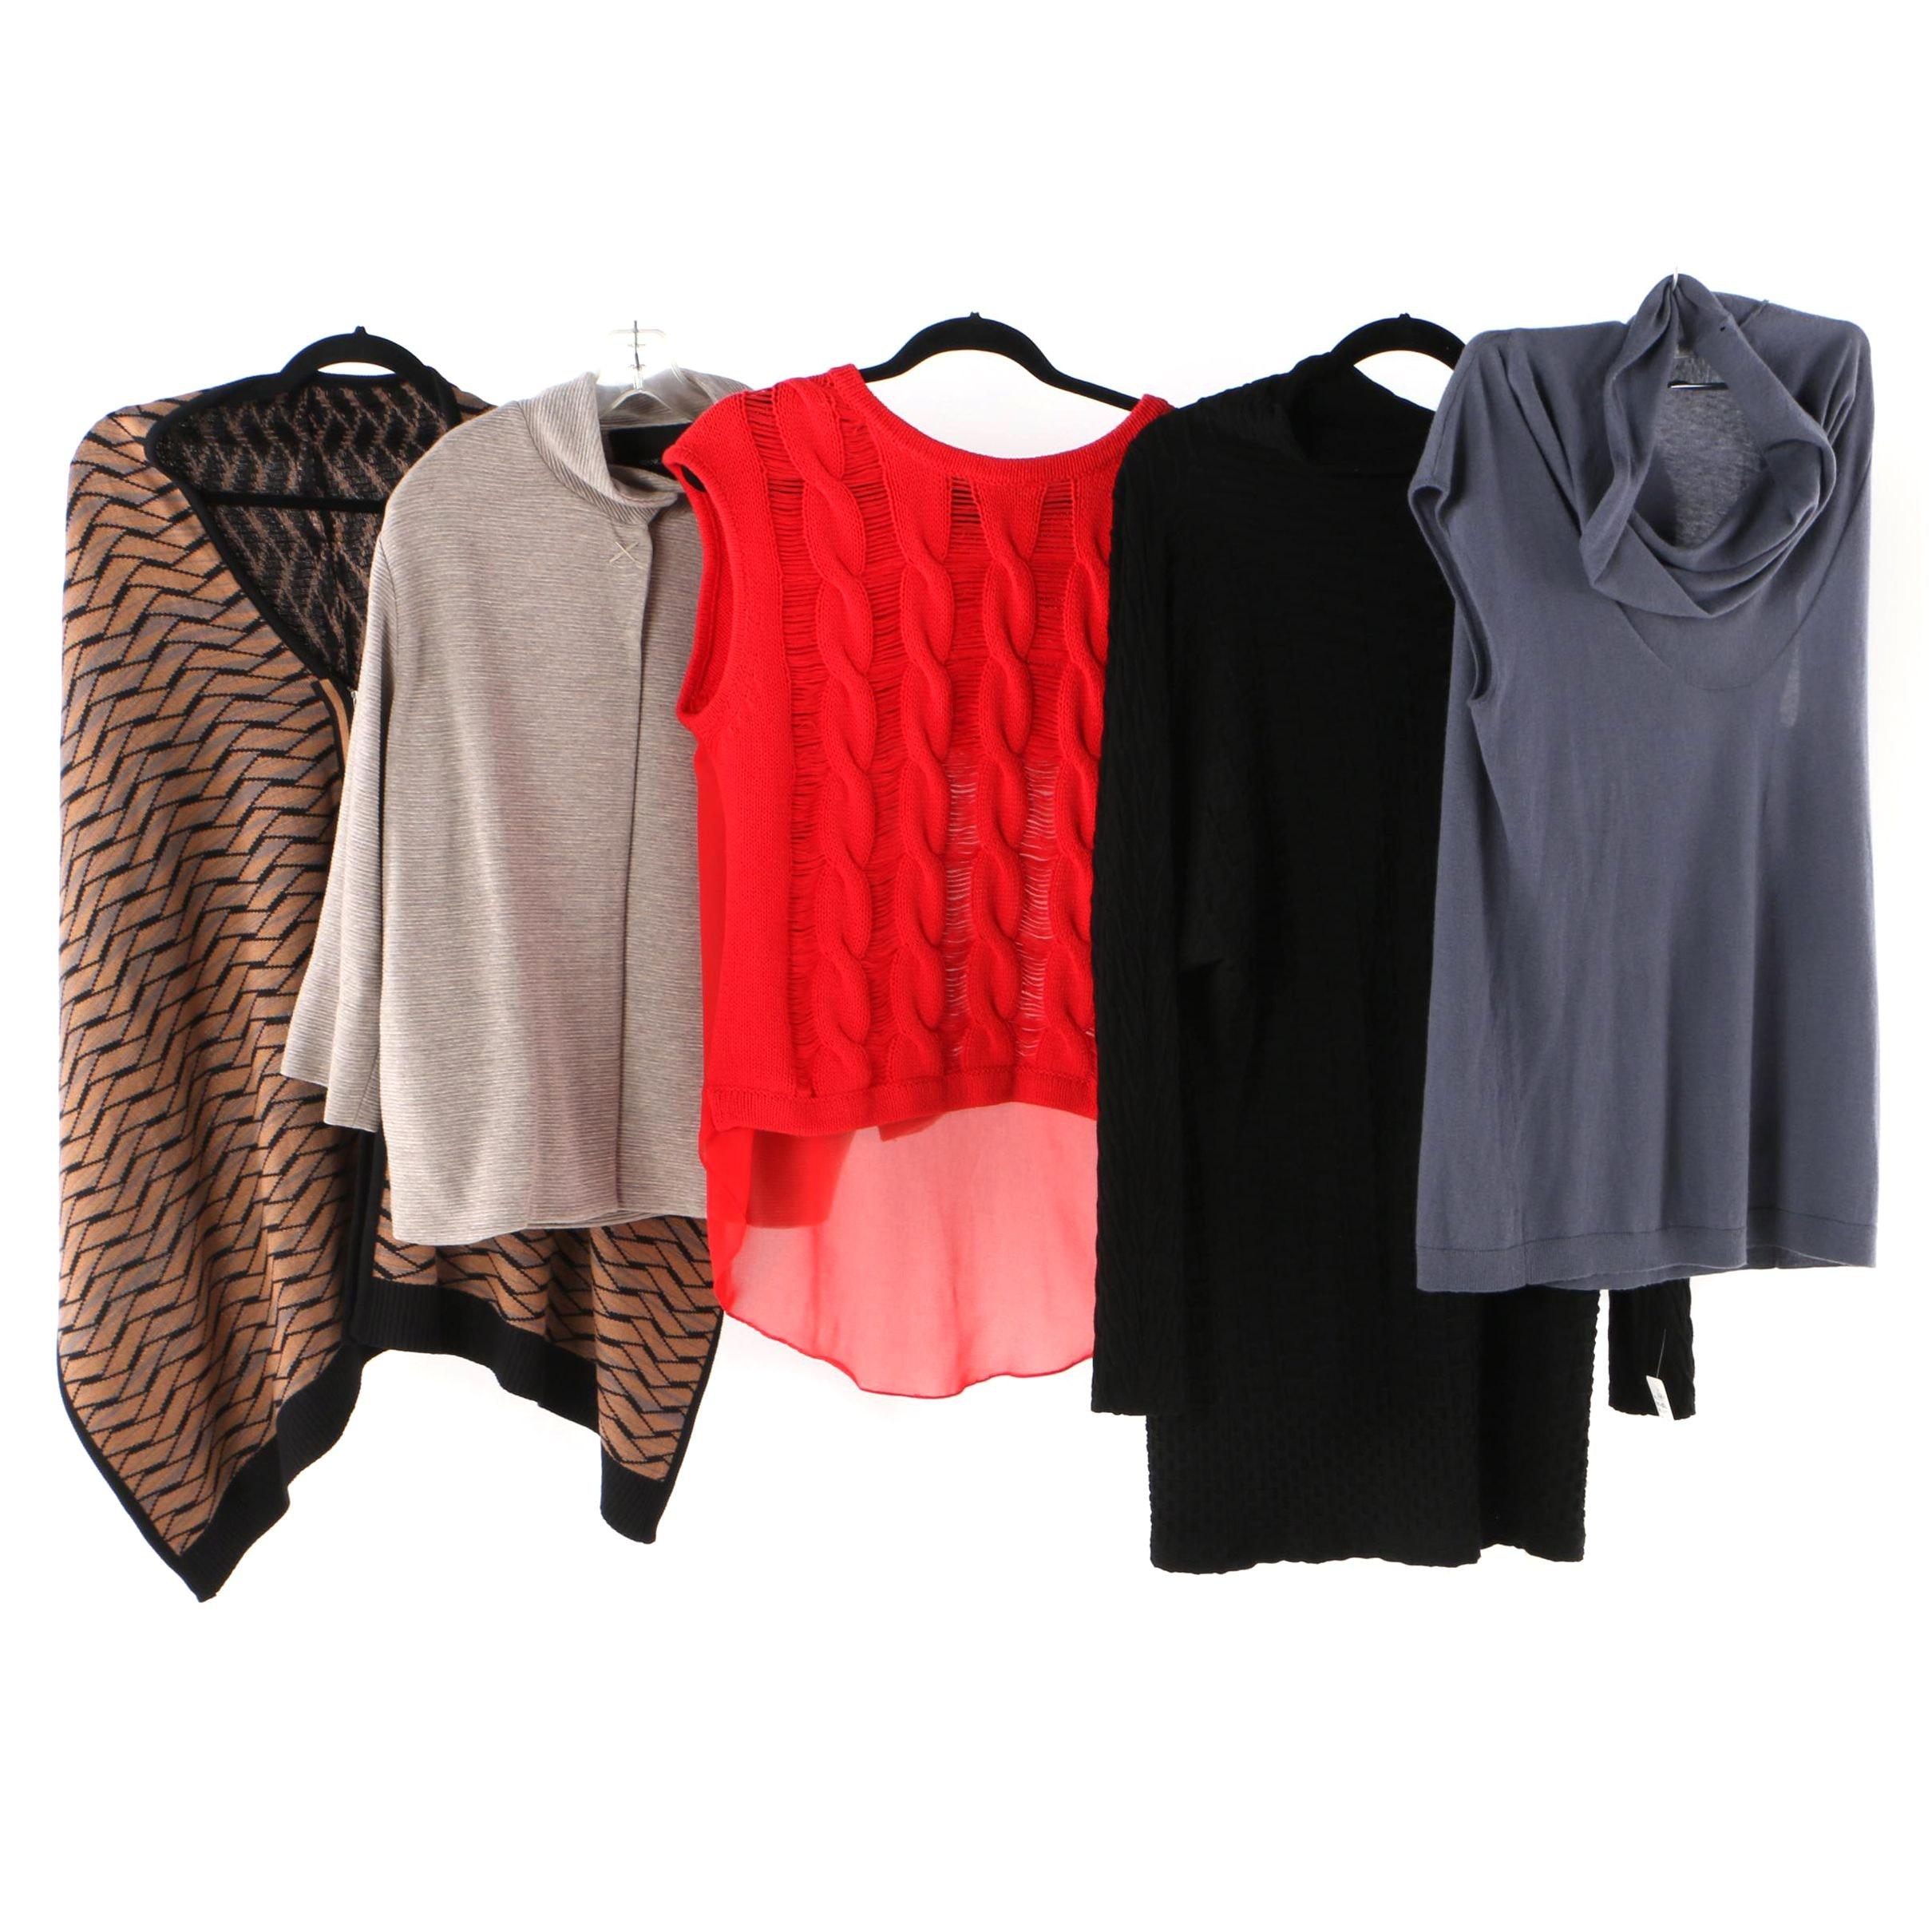 Women's Biancalancia, Tahari, Rostfrei and Donna Karan Clothing Separates